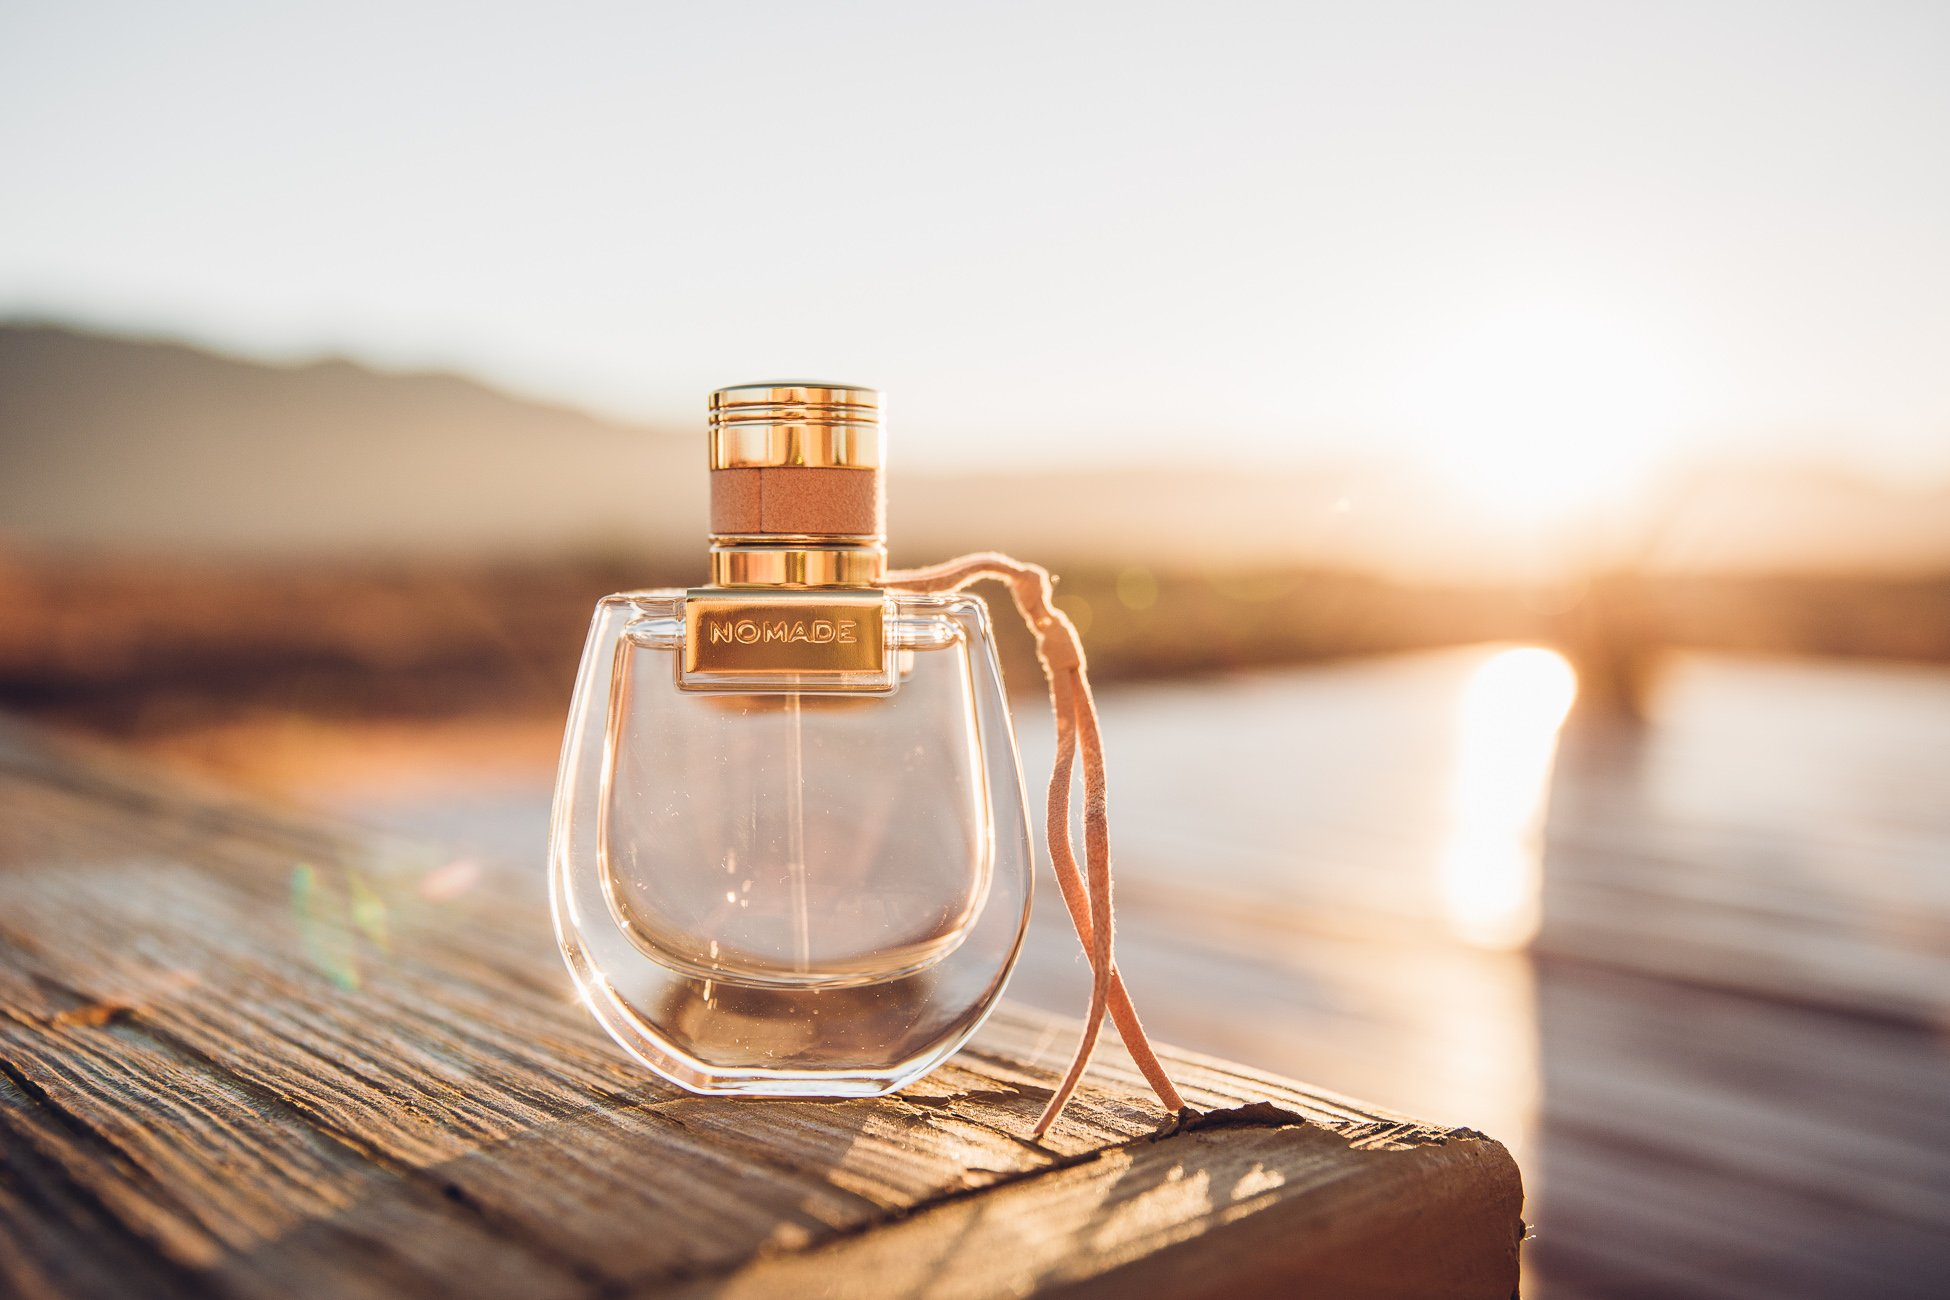 Ароматы путешествий: куда зовут нас парфюмы?